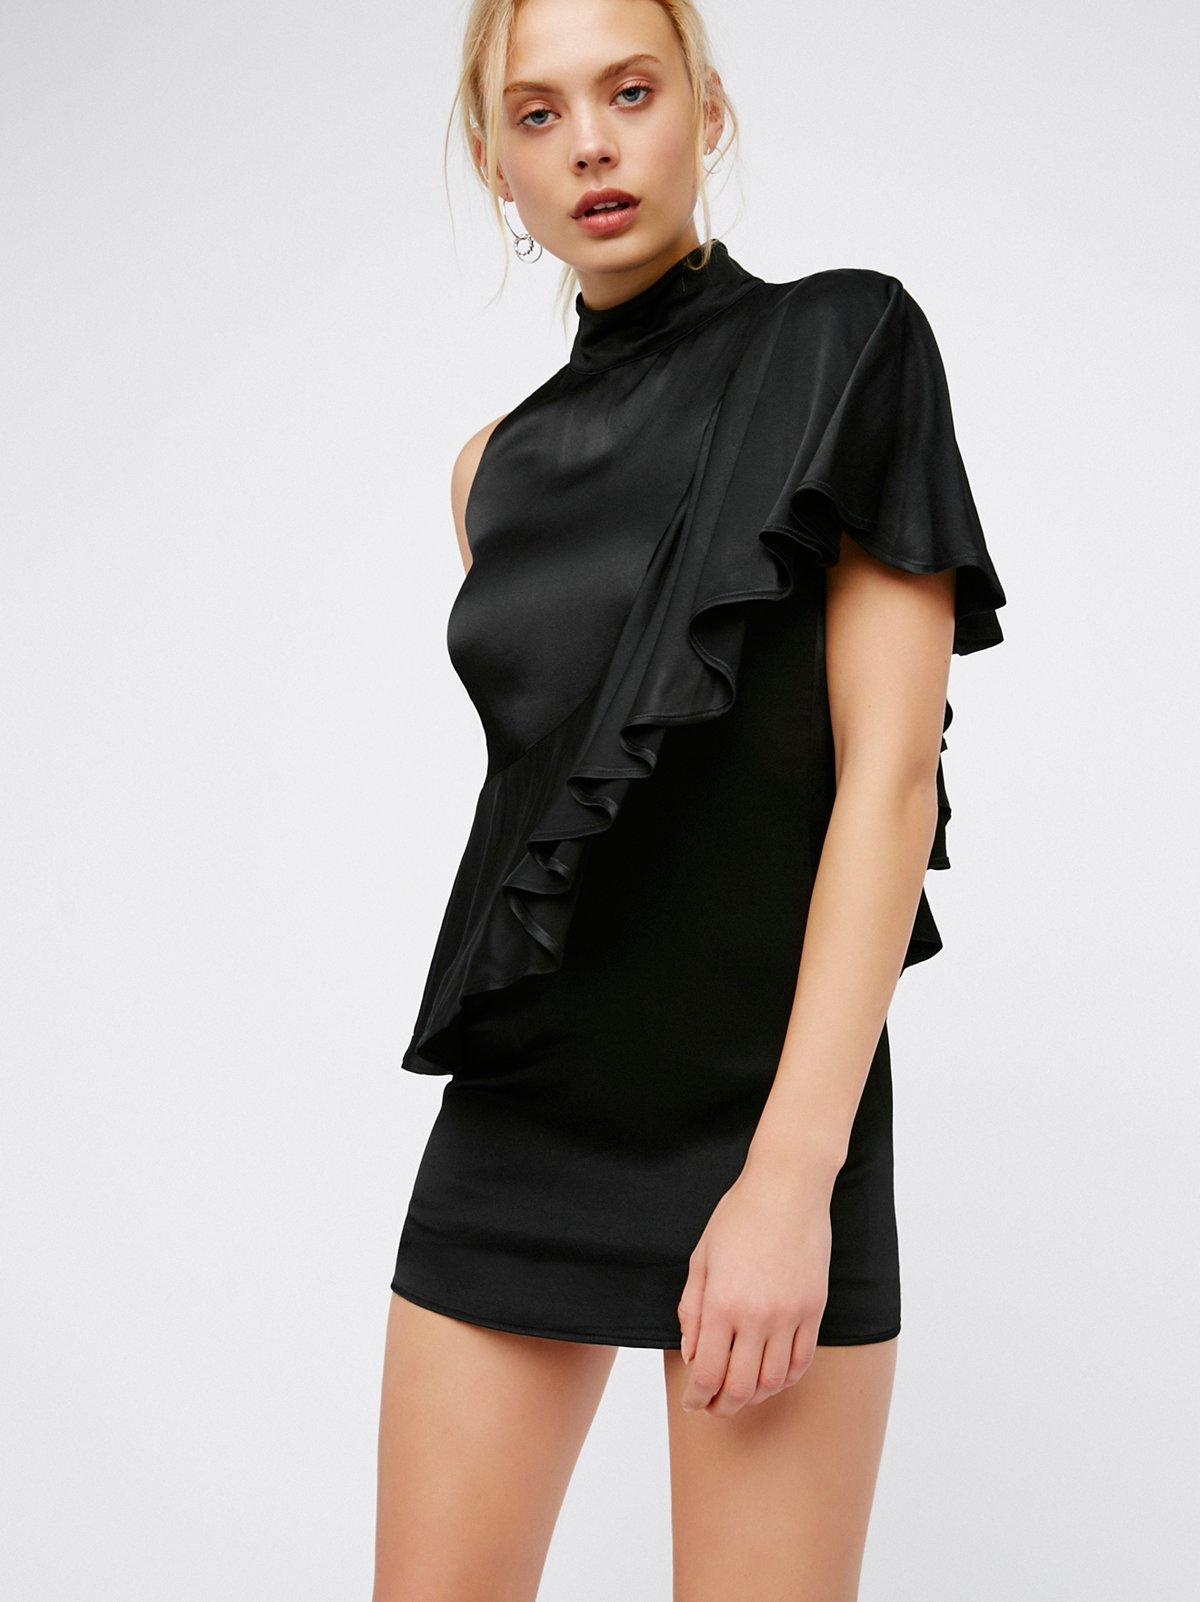 57th Street连衣裙